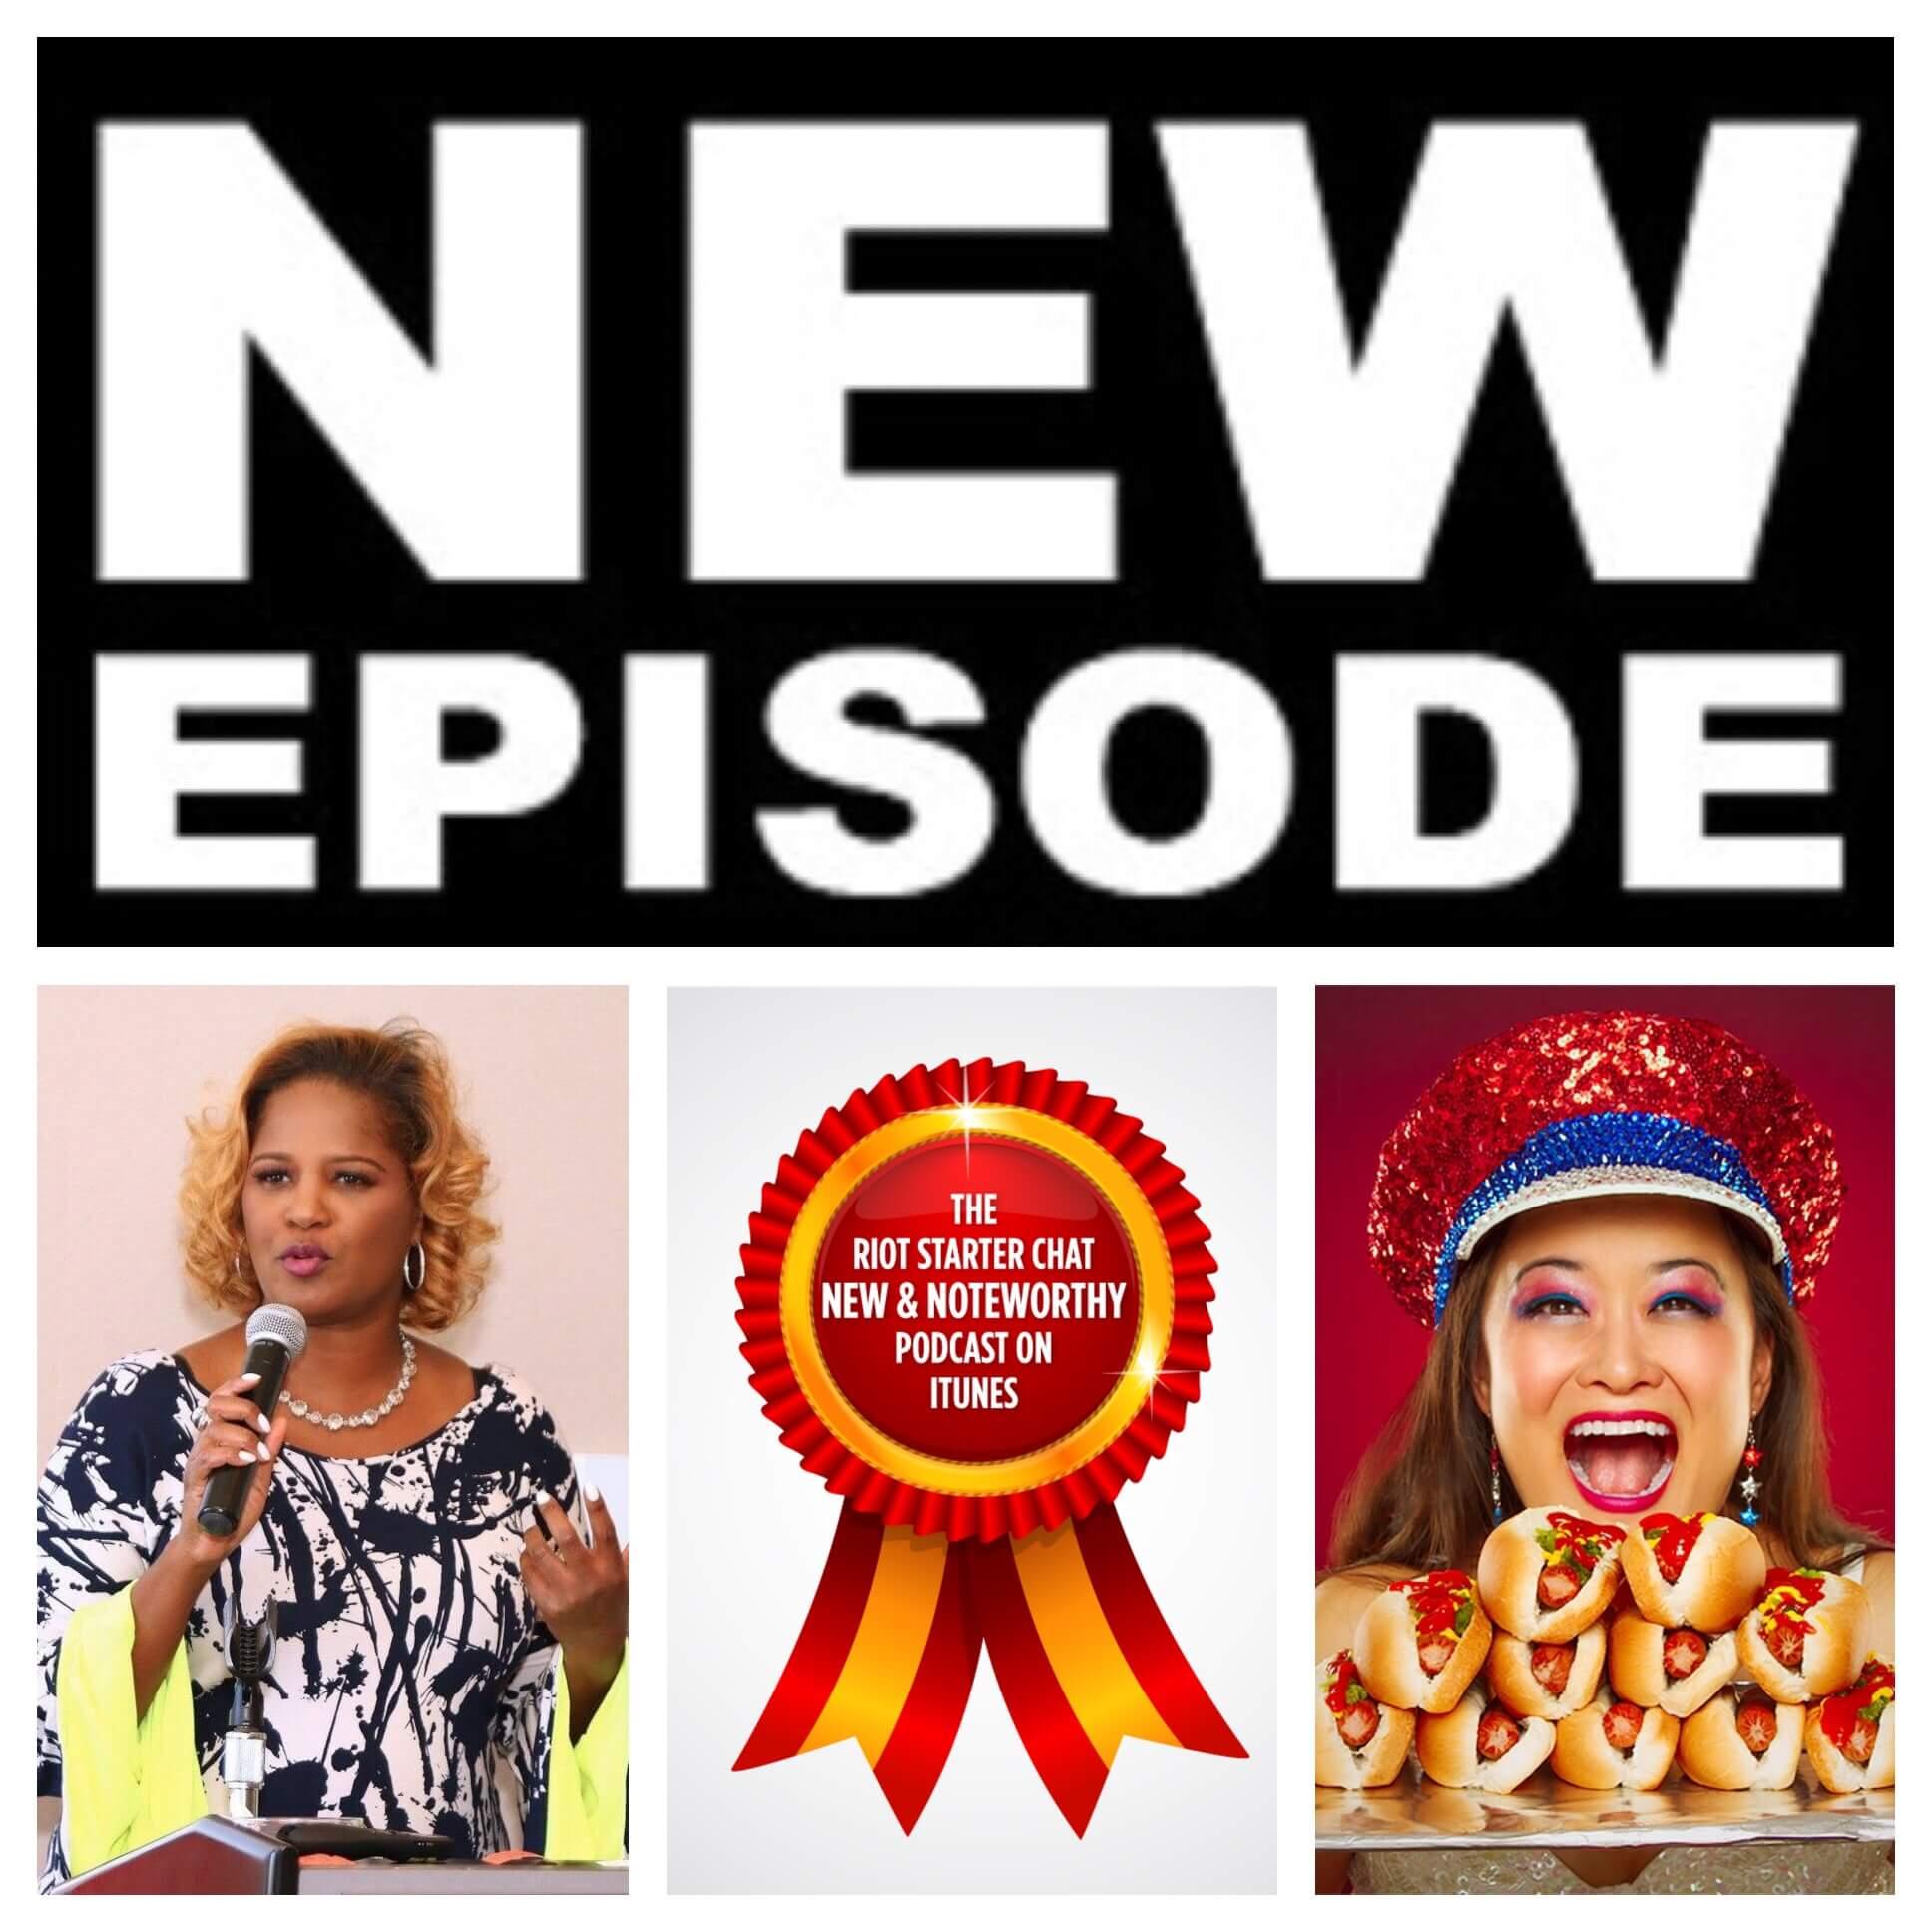 Riot Starter Podcast Episode - eatbemary